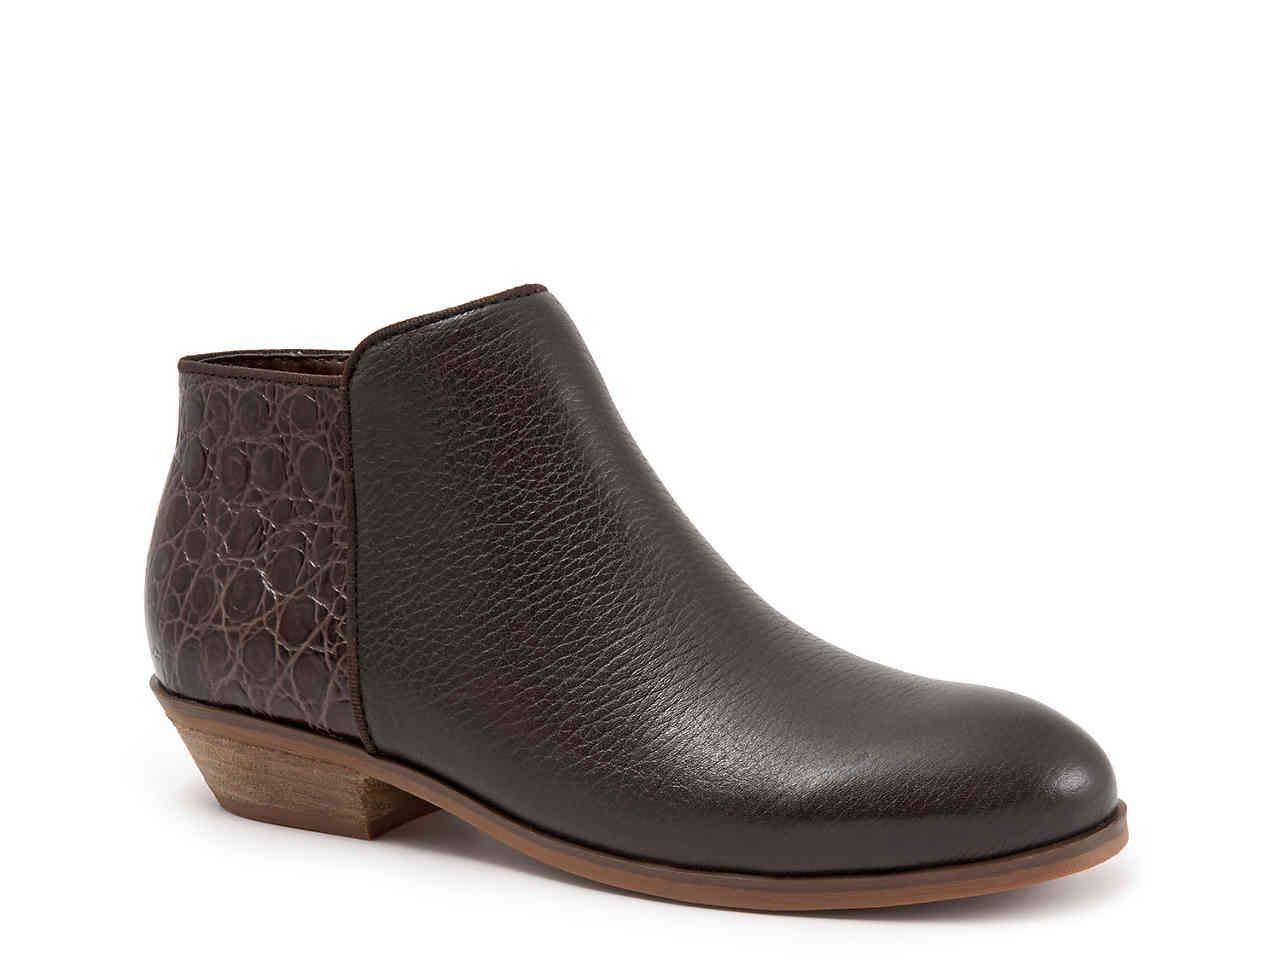 66c694fbf925d9 Lyst - Softwalk® Rocklin Bootie in Brown